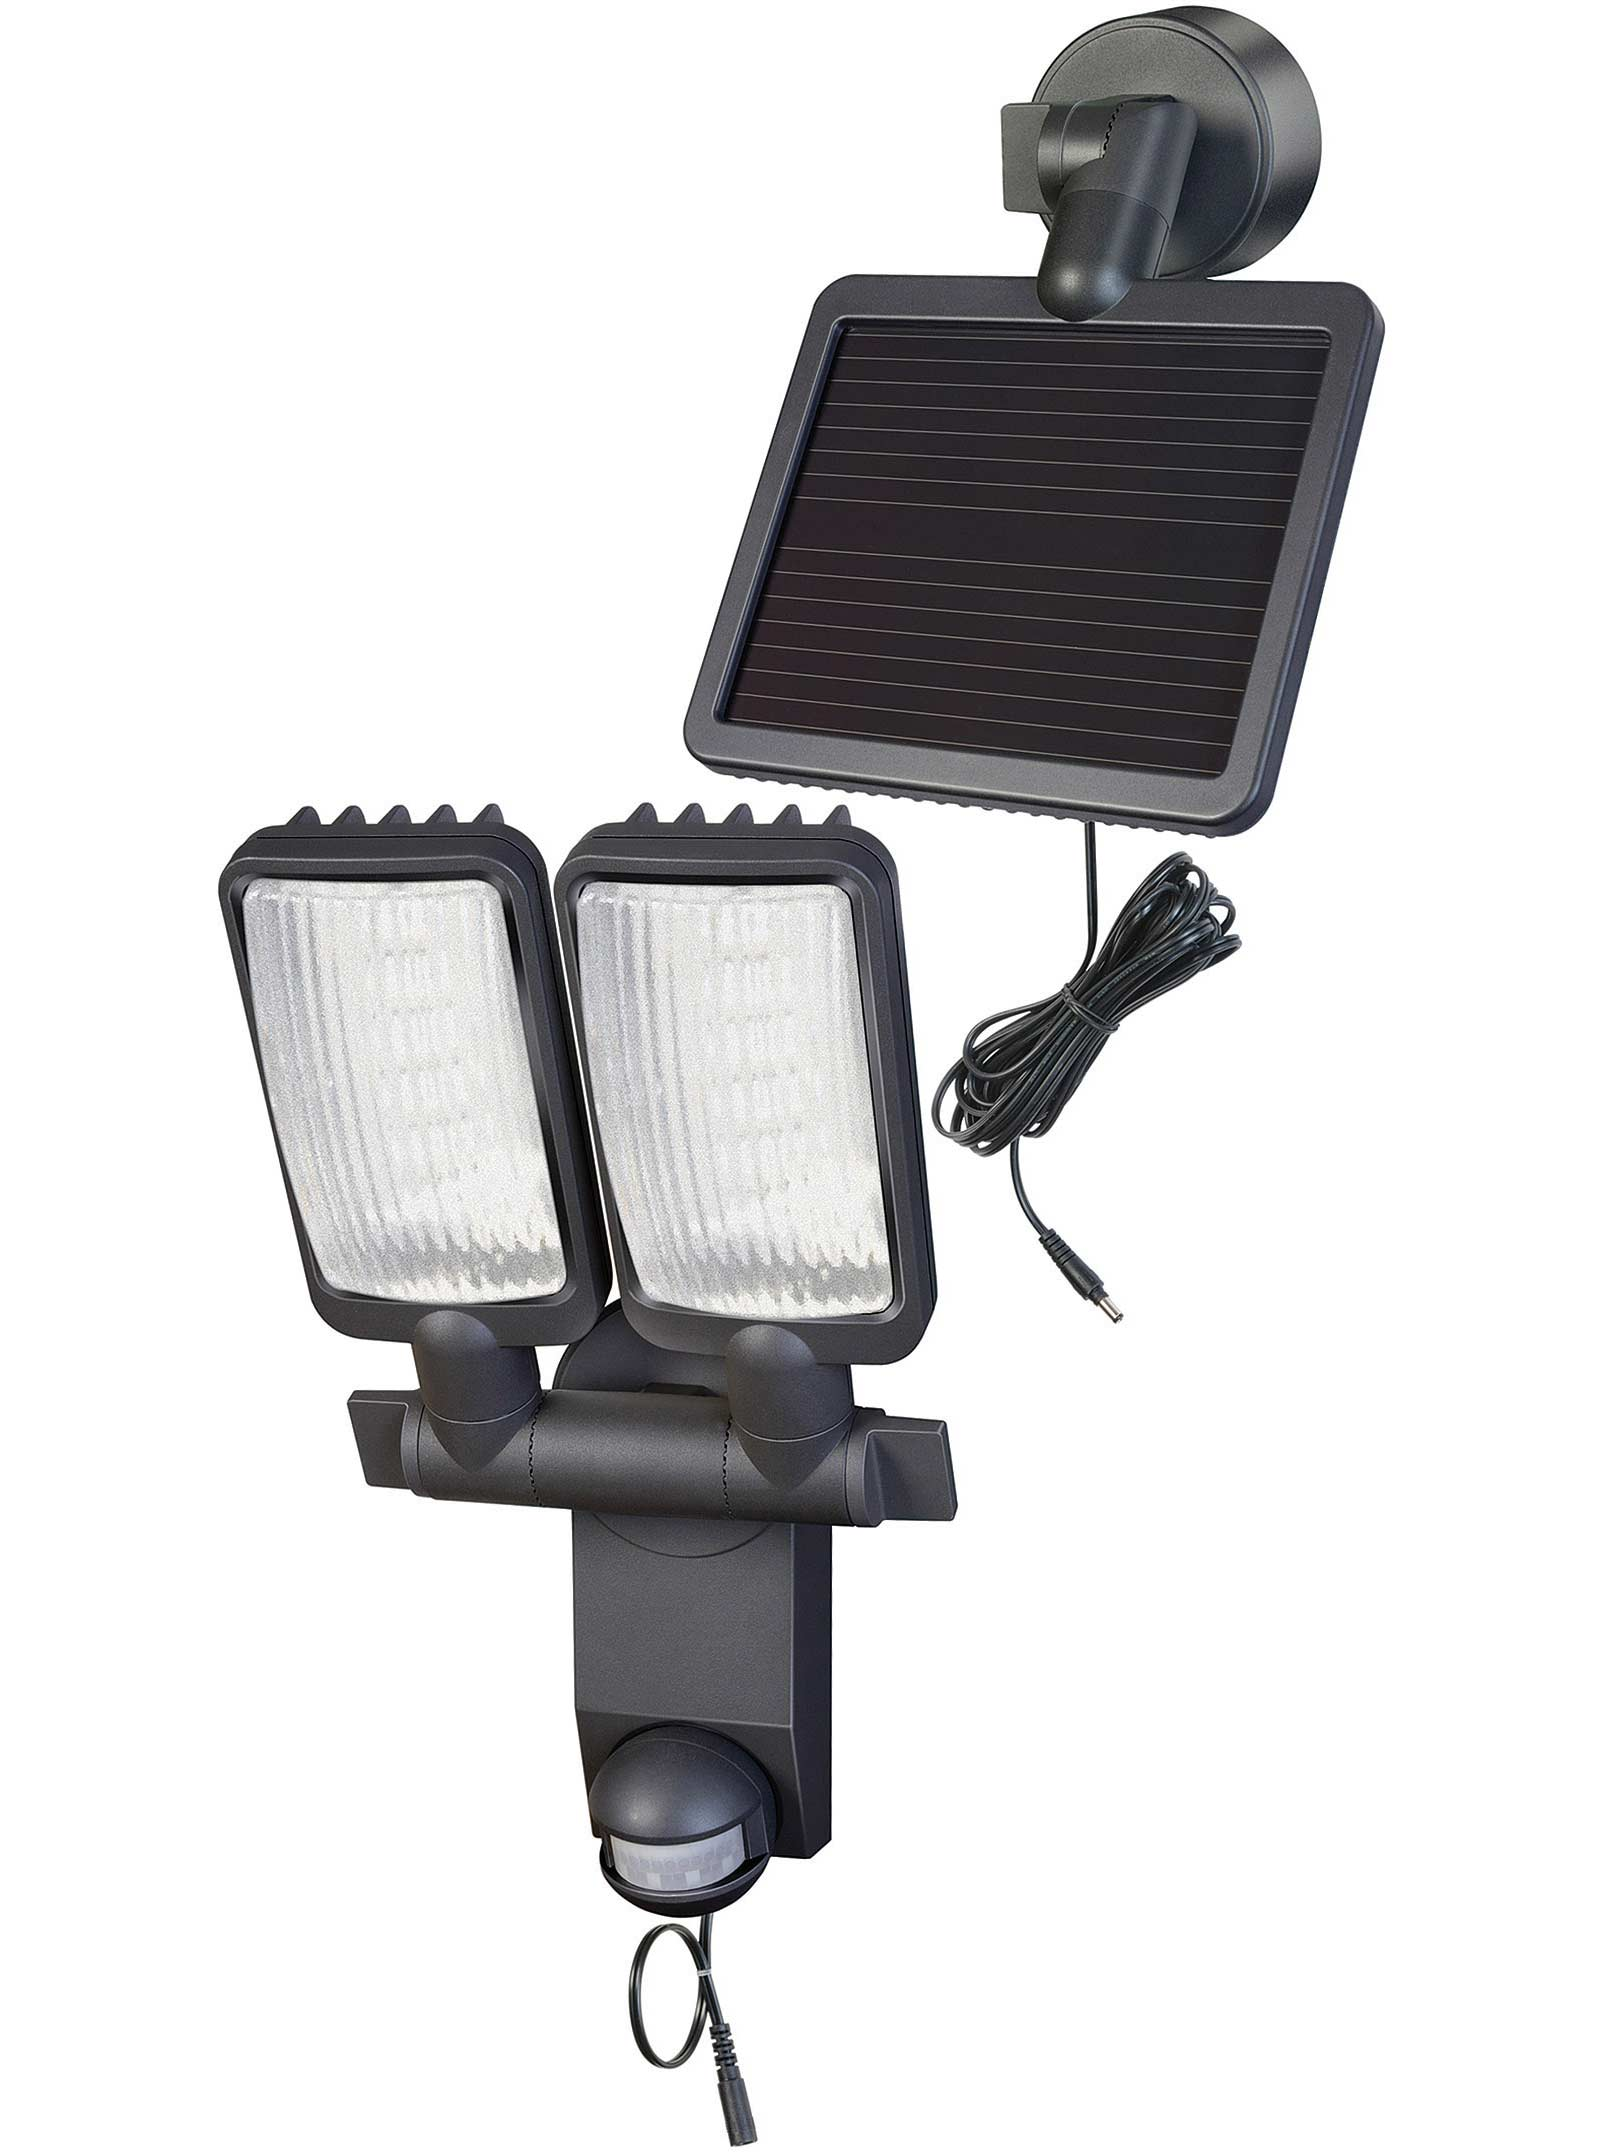 brennenstuhl solar led leuchte duo premium sol lv1205 p2 mit bewegung bei. Black Bedroom Furniture Sets. Home Design Ideas